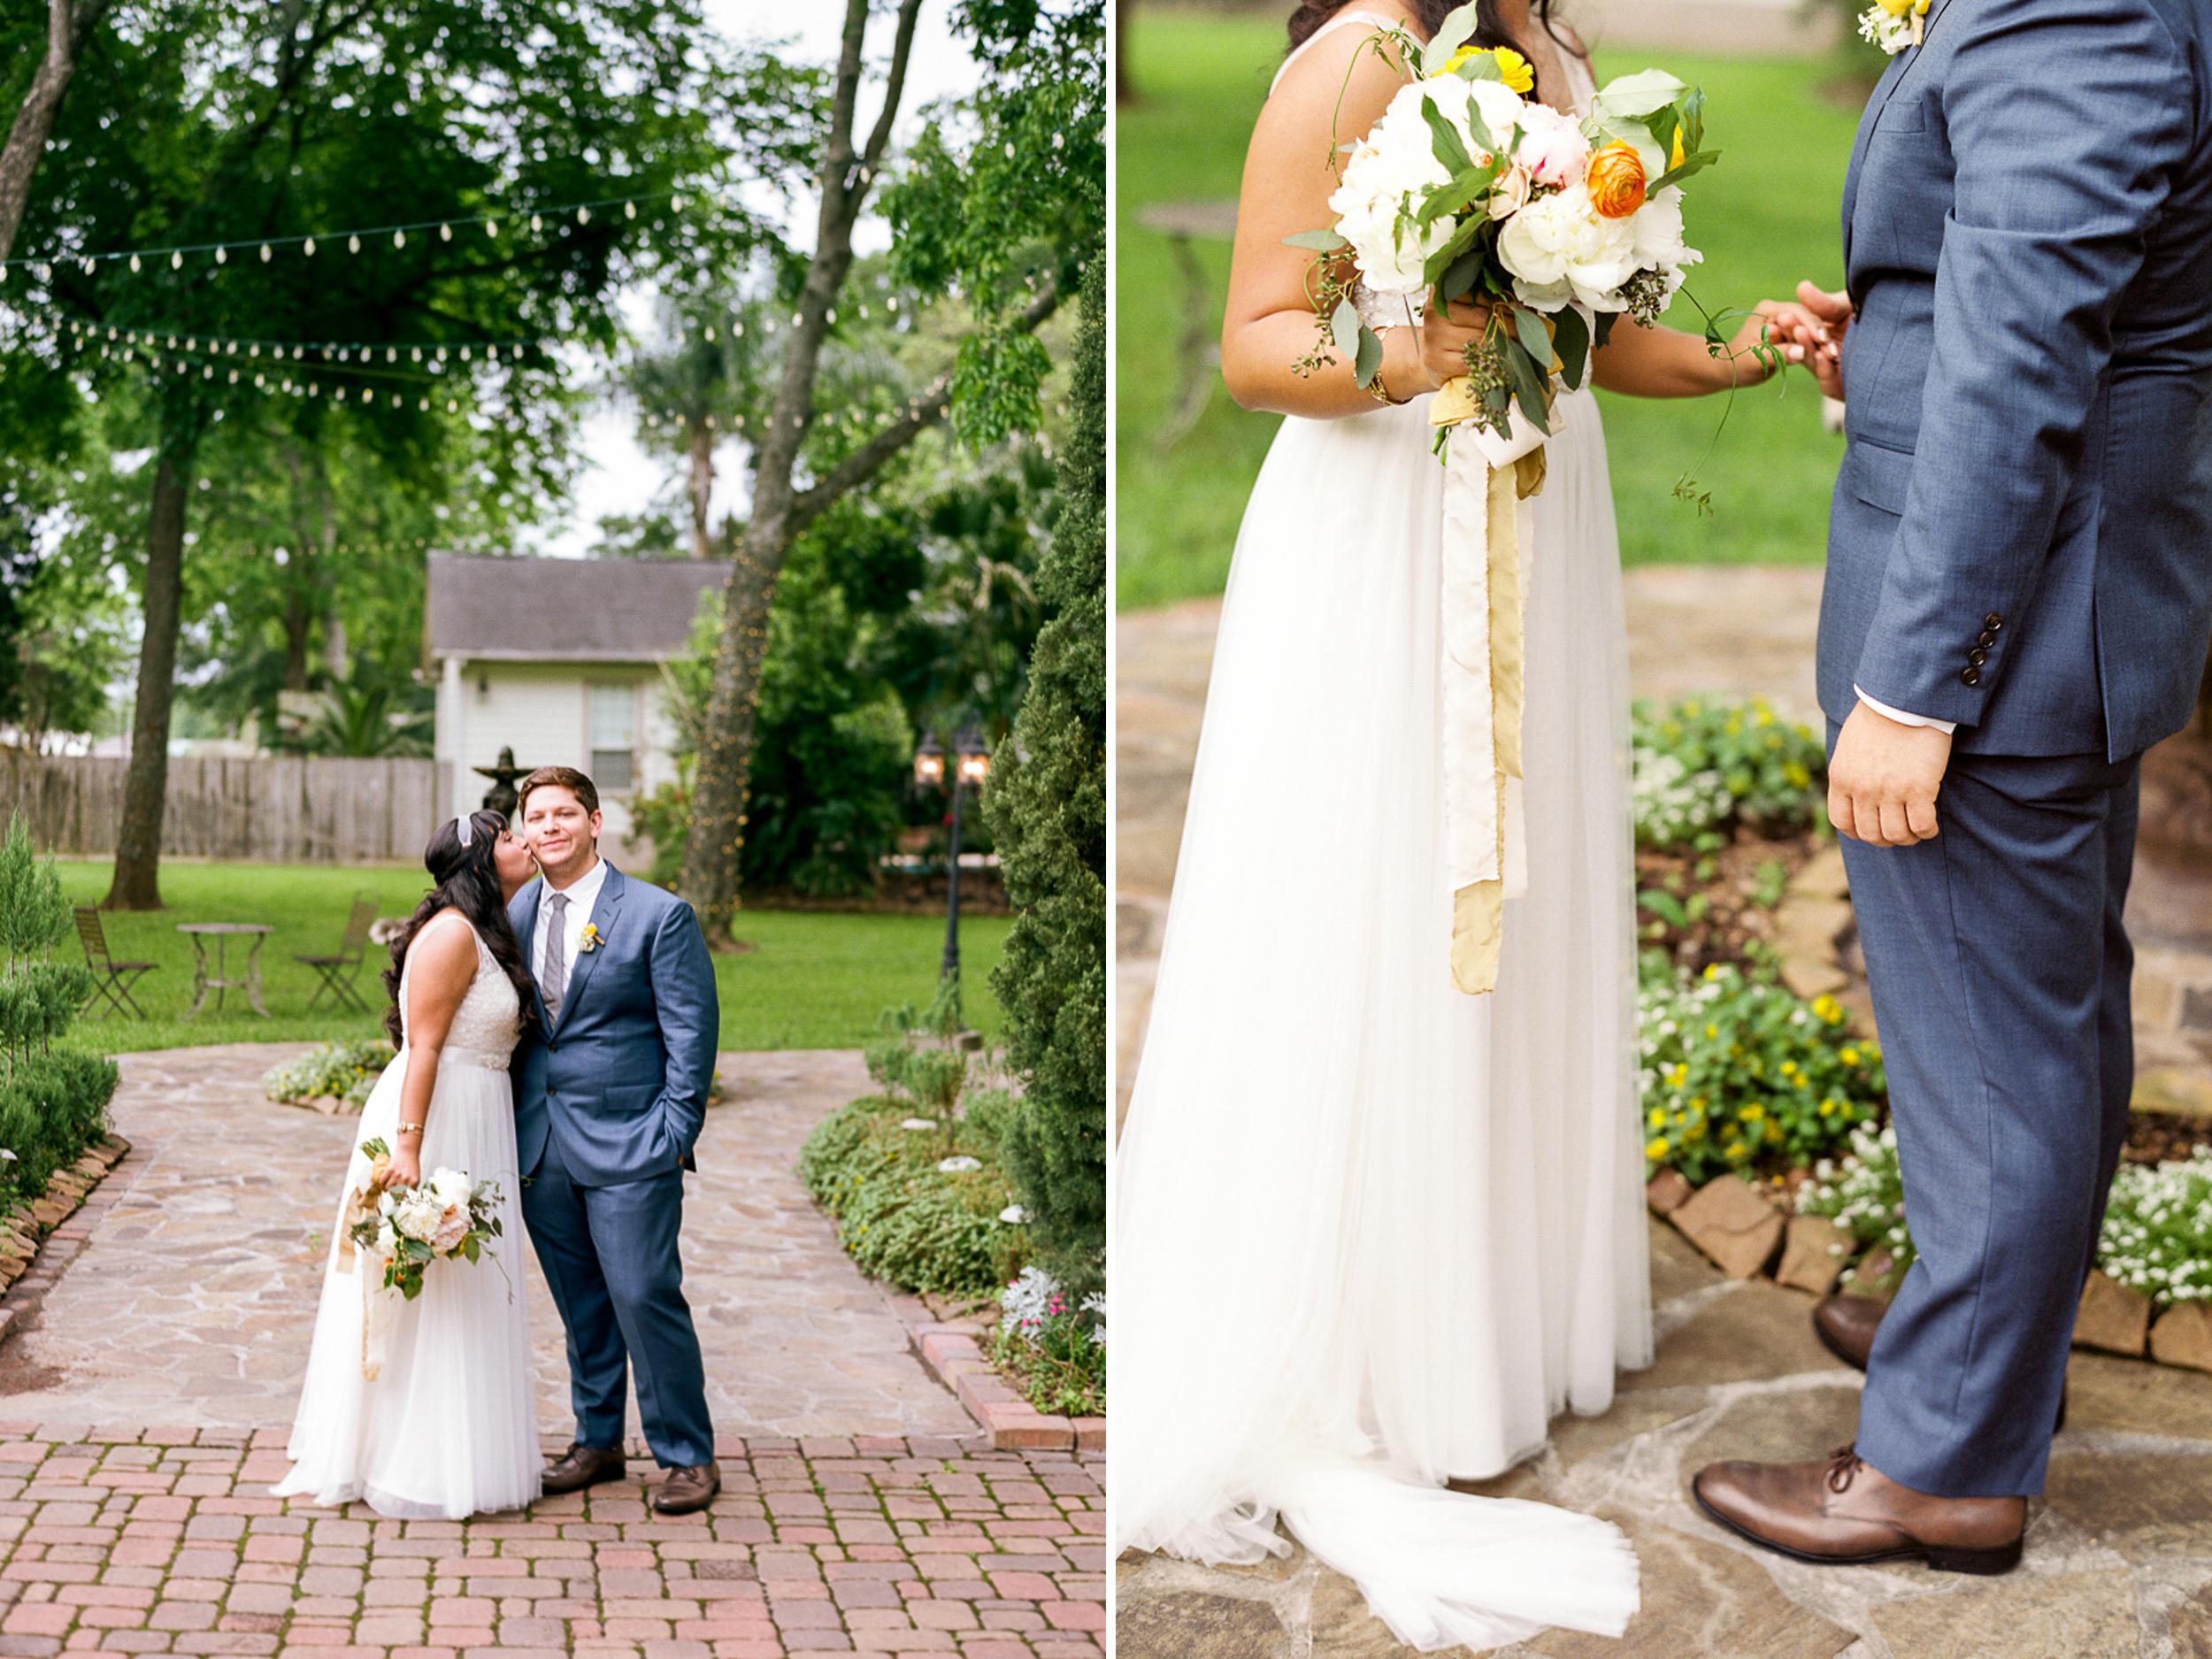 Dana Fernandez Photography Houston Texas Destination Photographer Film Ruffled Blog Wedding Bridal First Look Featured Photography Oak Tree Manor Houston-31.jpg